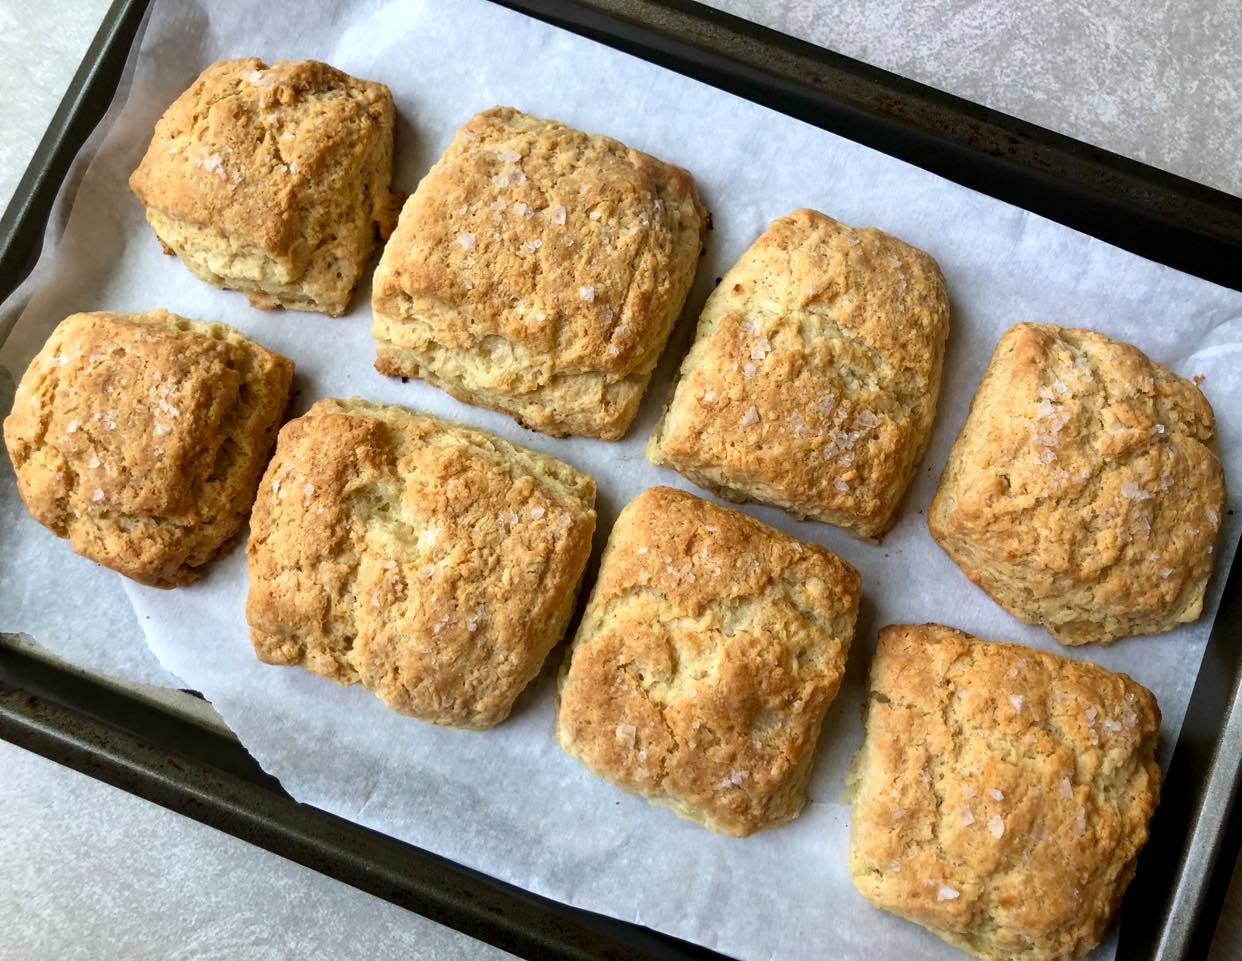 BIUAN Roasted Garlic Butter Biscuits 1